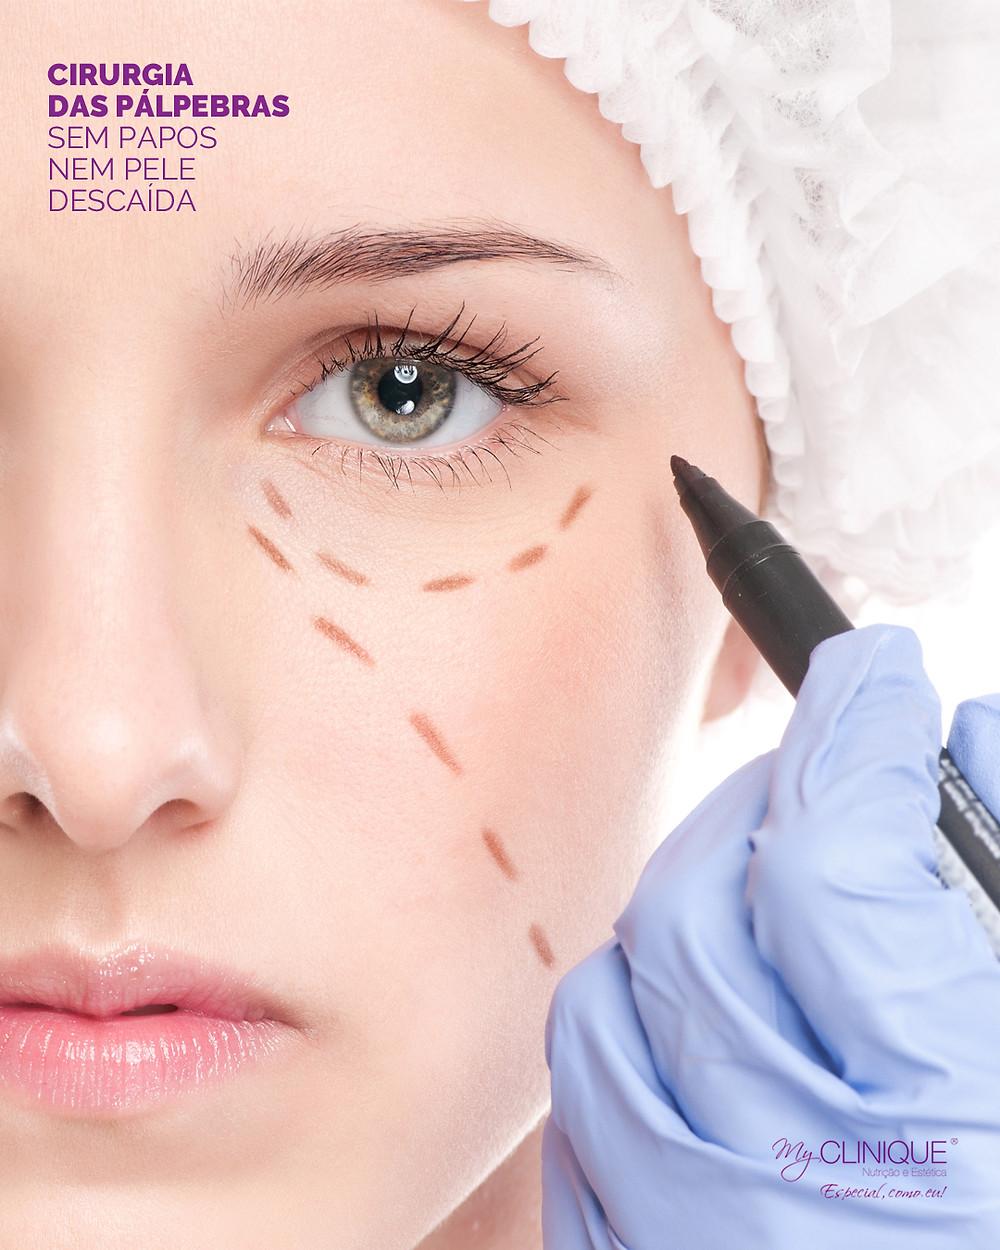 myclinique cirurgia das palpebras